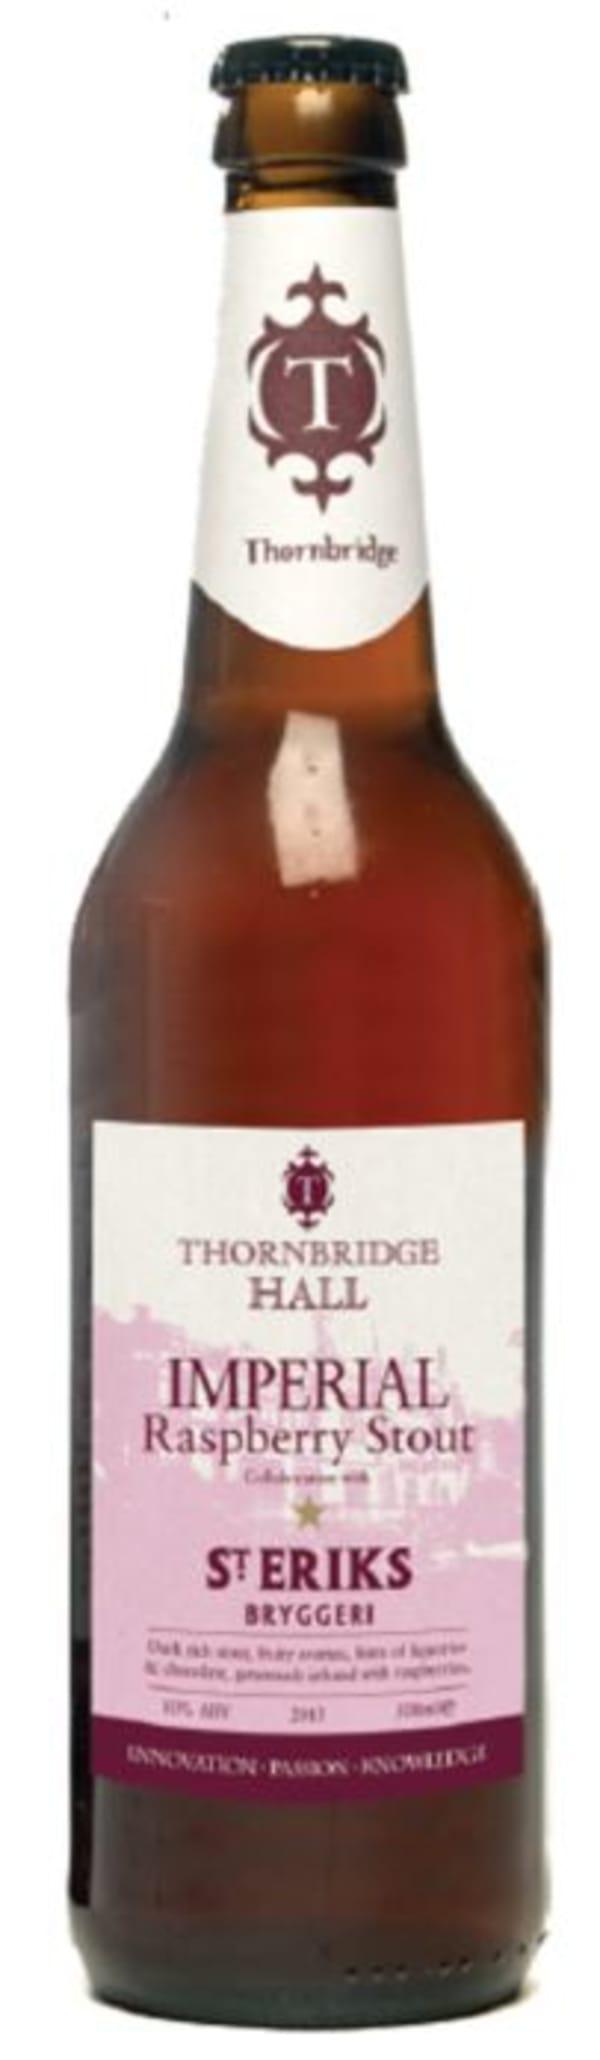 Thornbridge Imperial Raspberry Stout